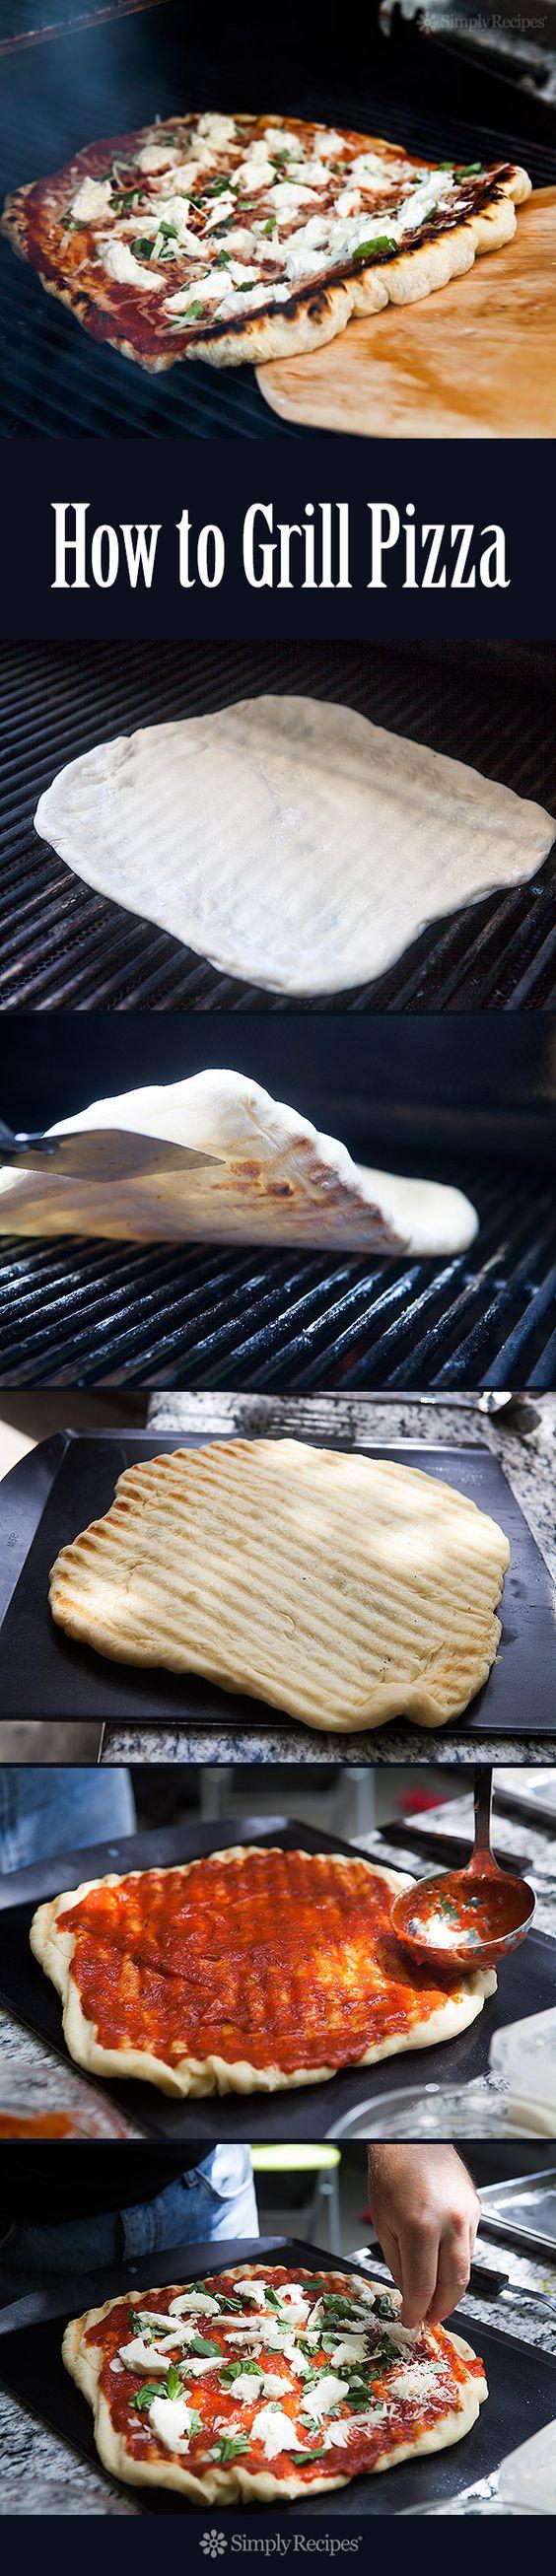 Svona á að grilla pizzu #grill #grillsnild #pizzarella